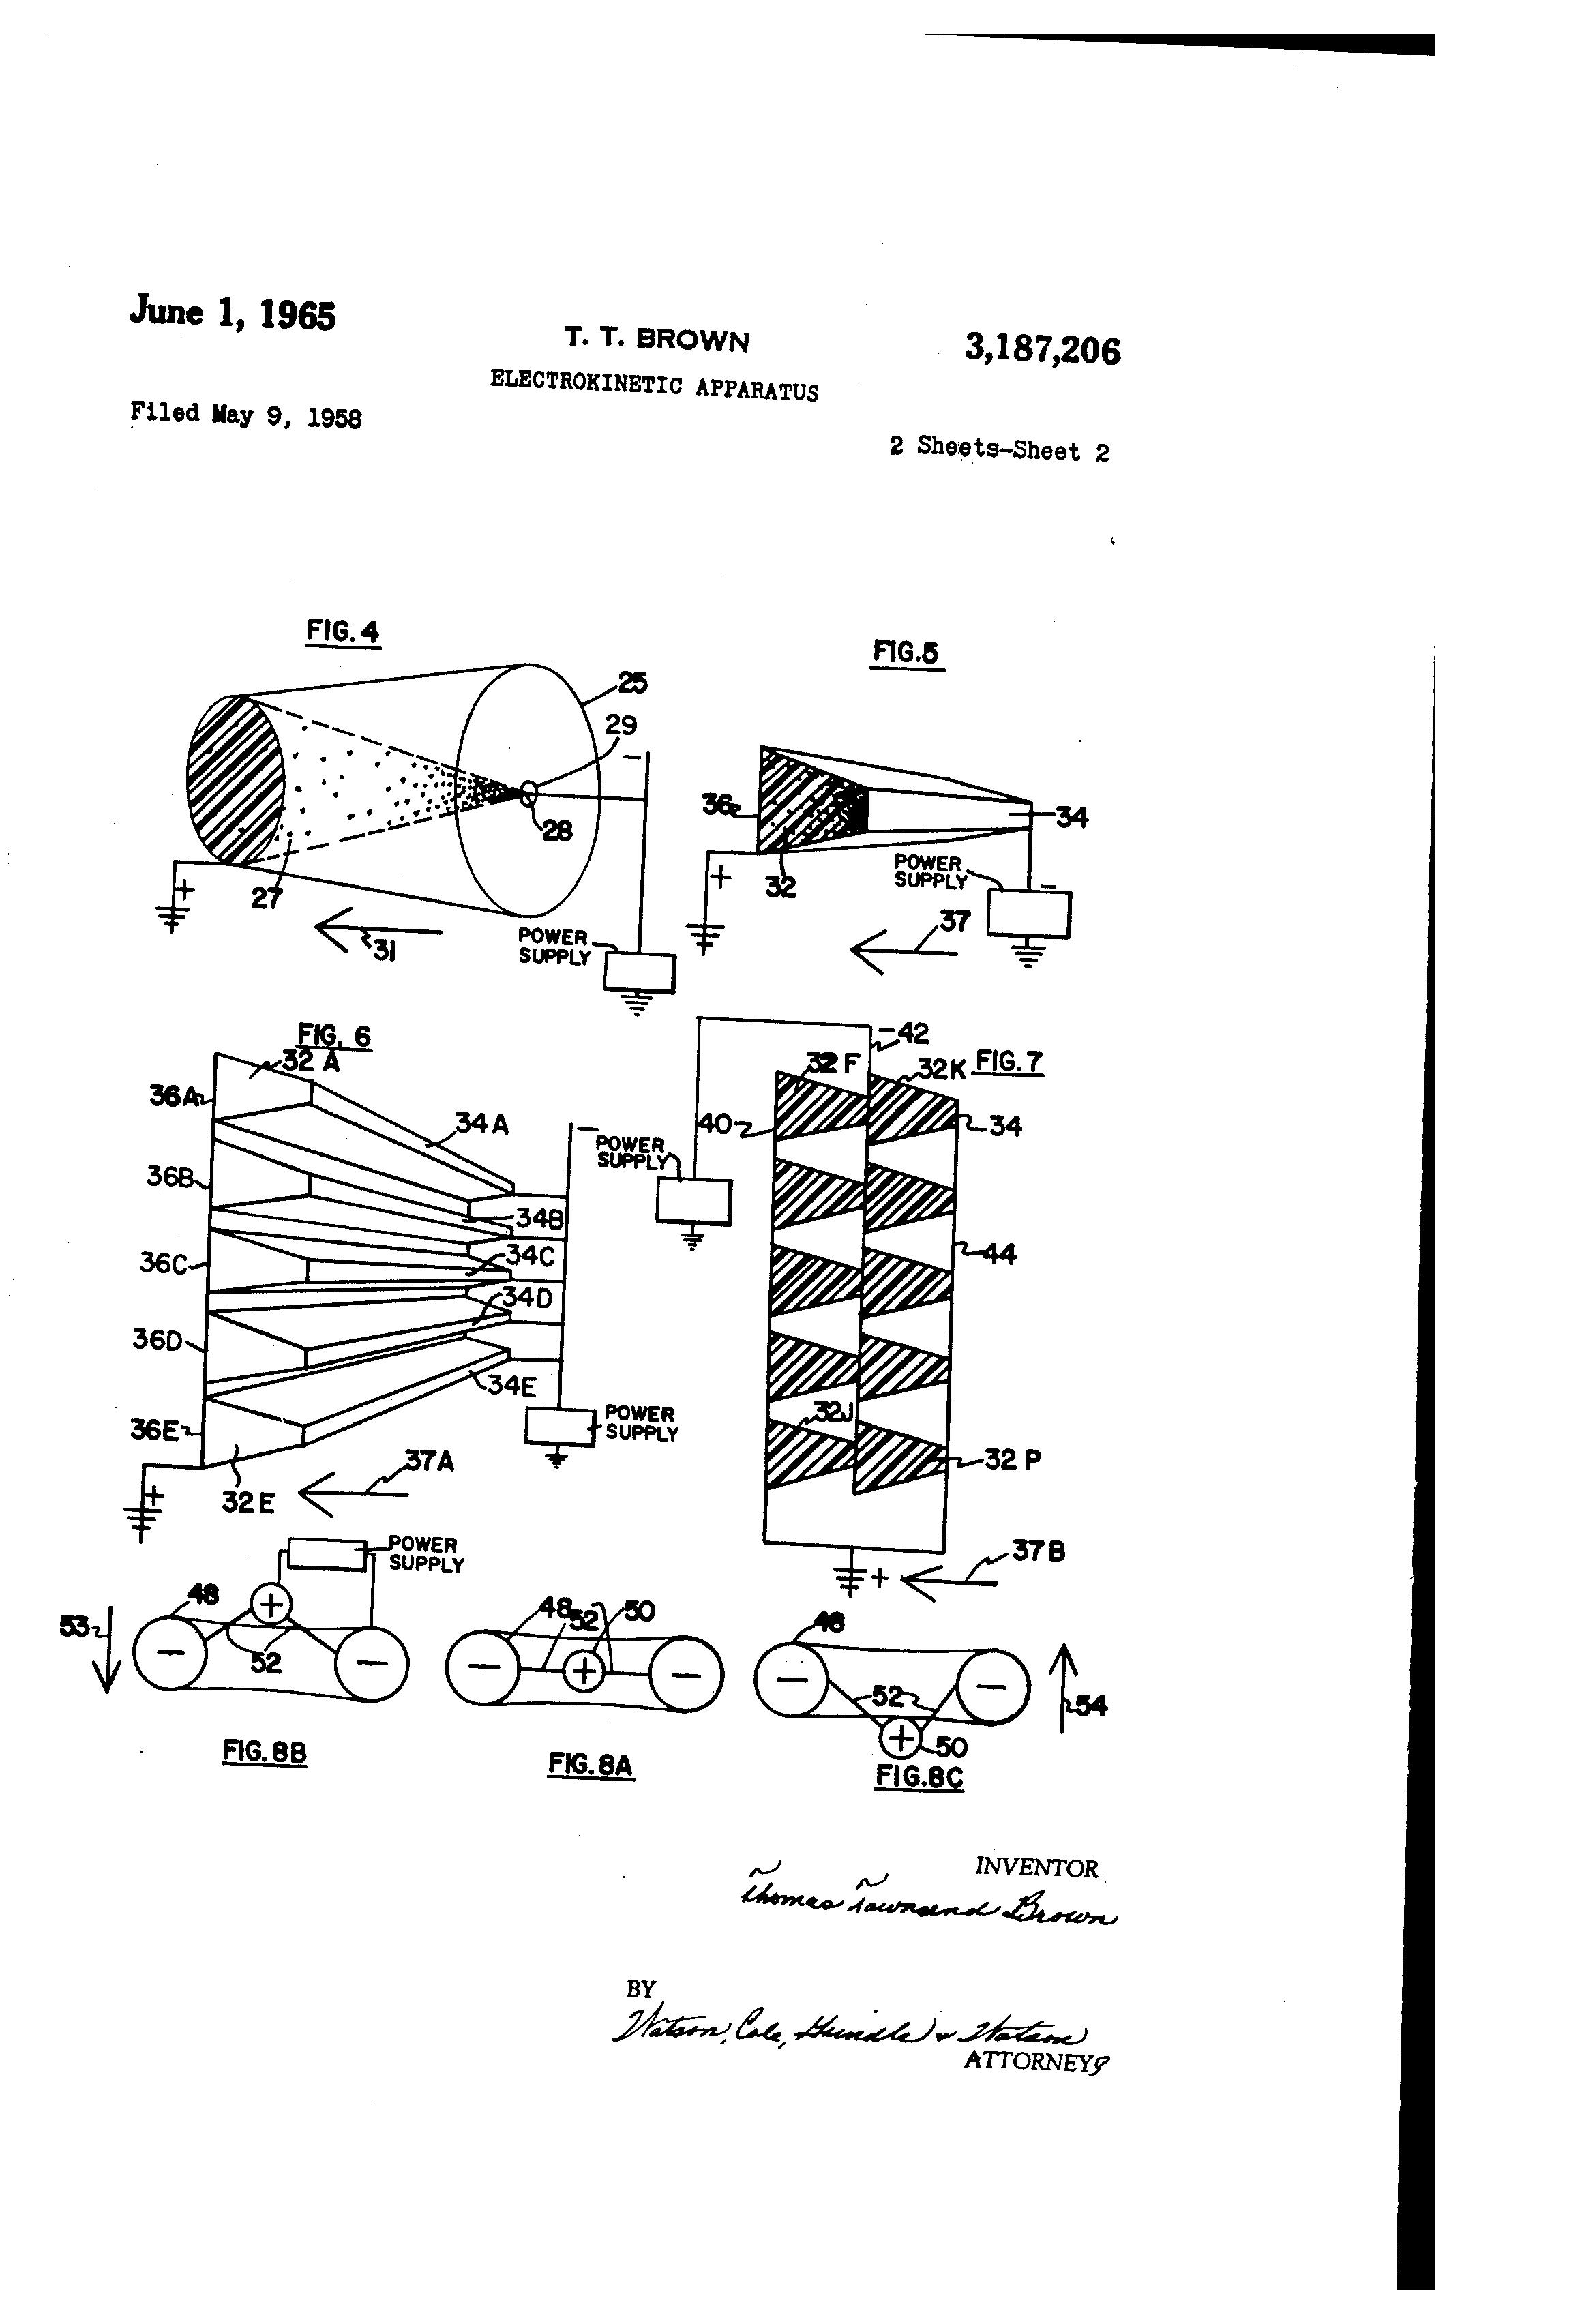 patent us3187206 - electrokinetic apparatus